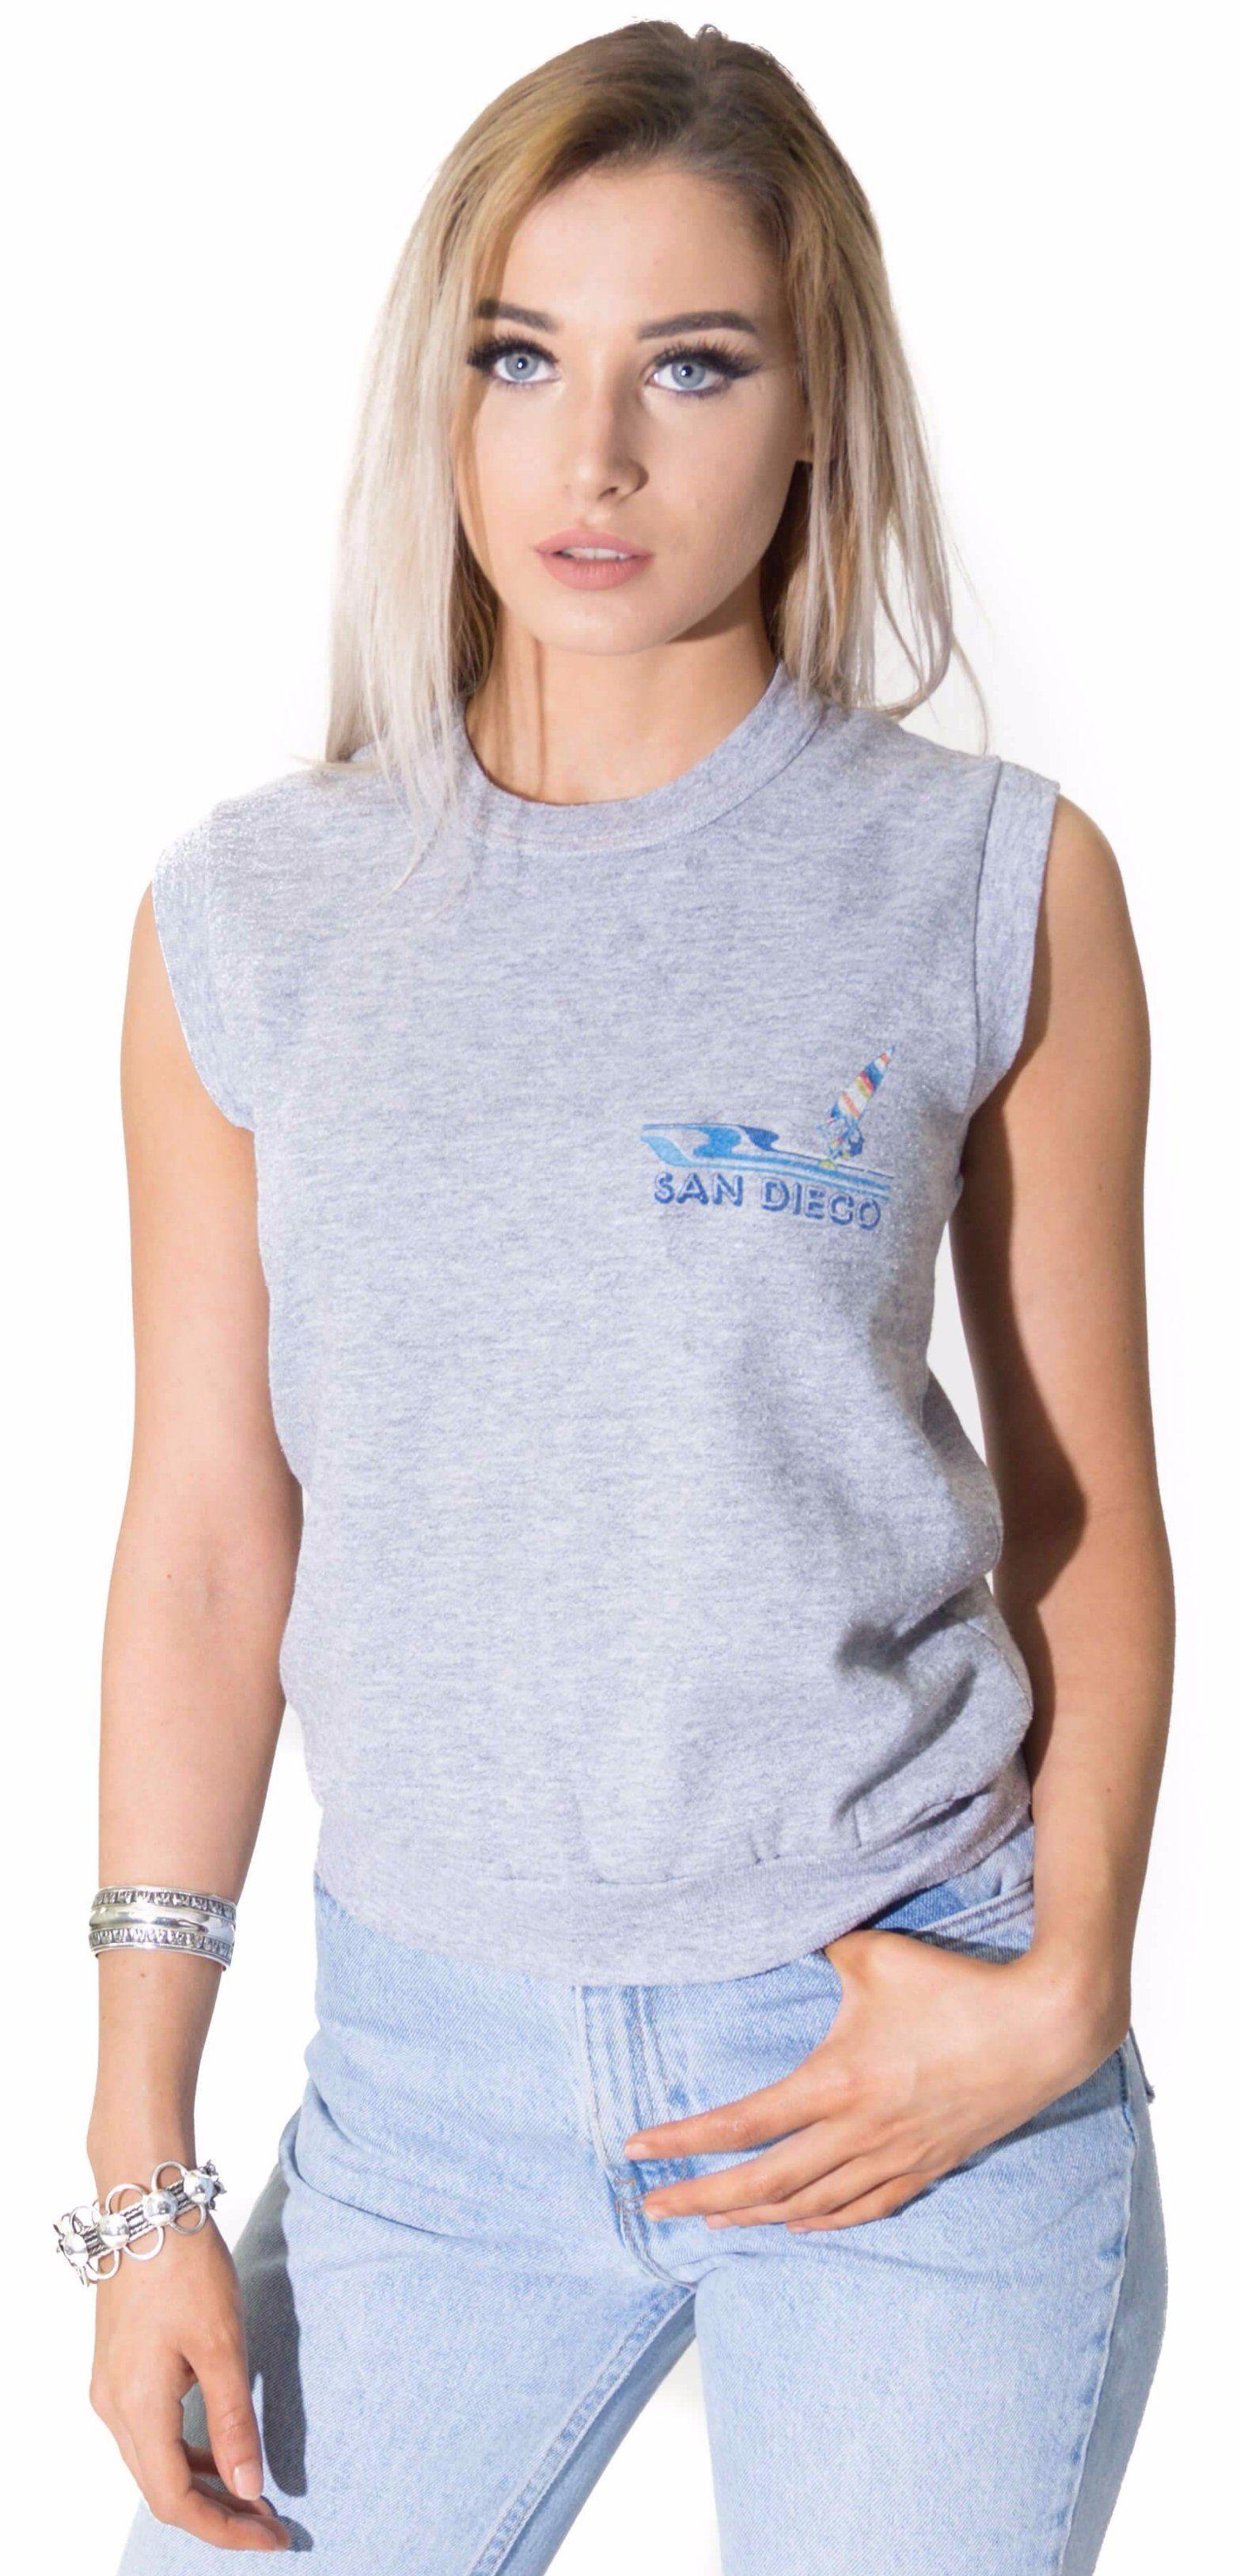 09131aca0015bd Retro San Diego Vintage Tank T-Shirt